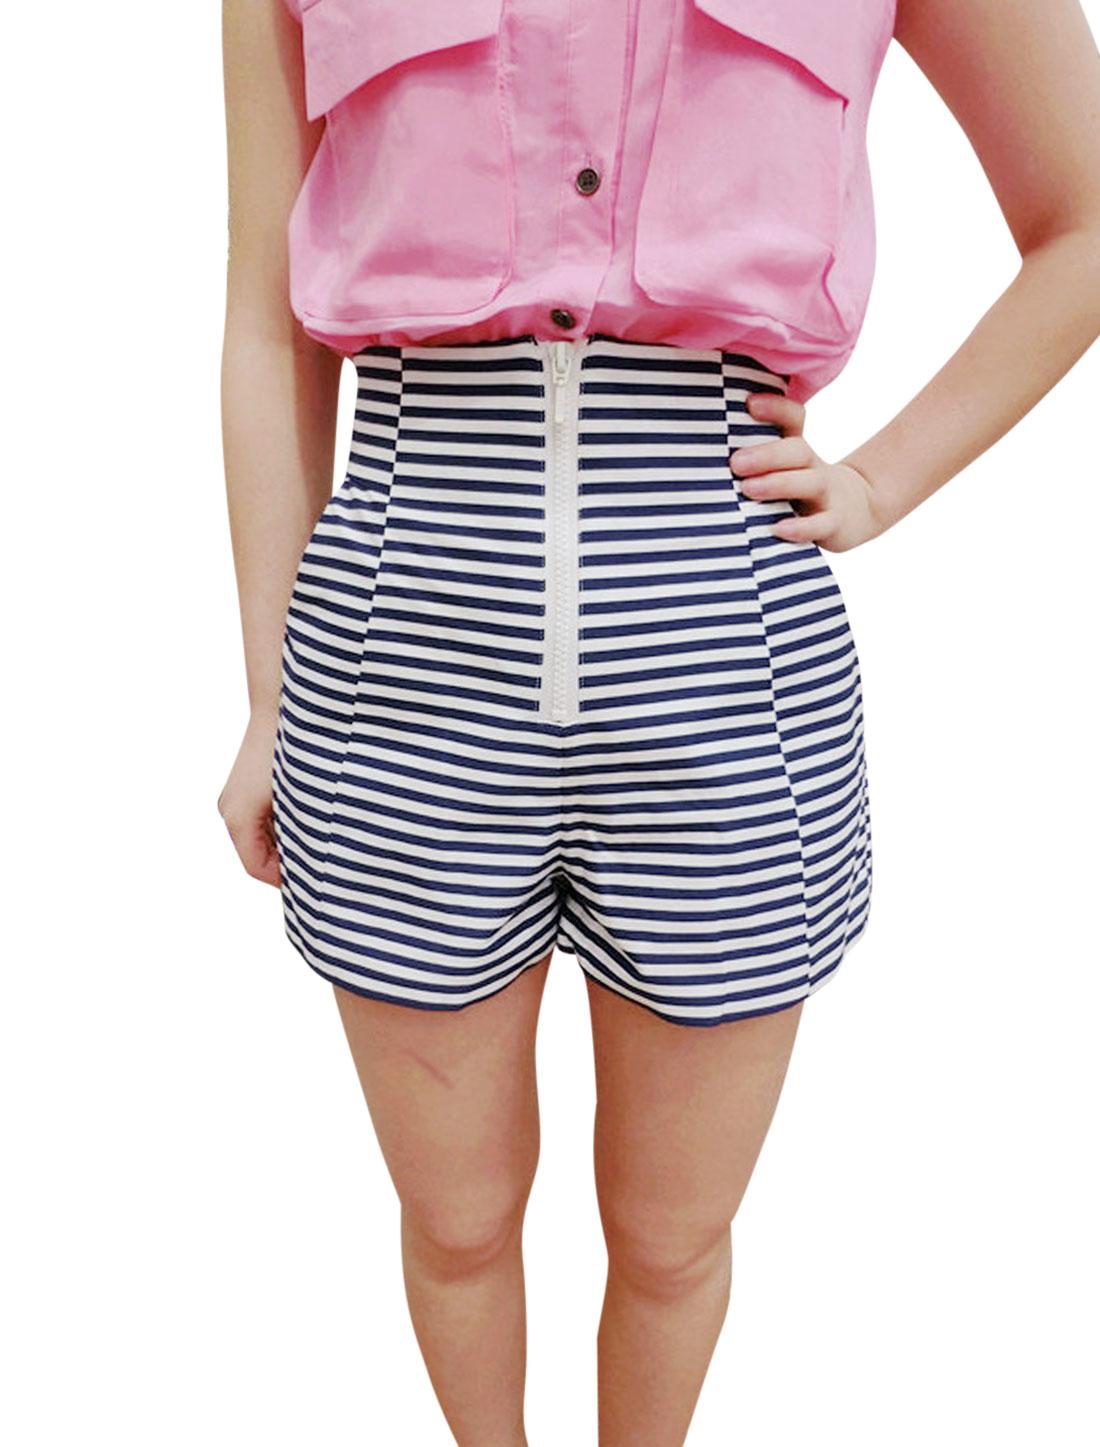 Lady High Rise Zip Front Stripes Slim Fit Shorts White Dark Blue XS